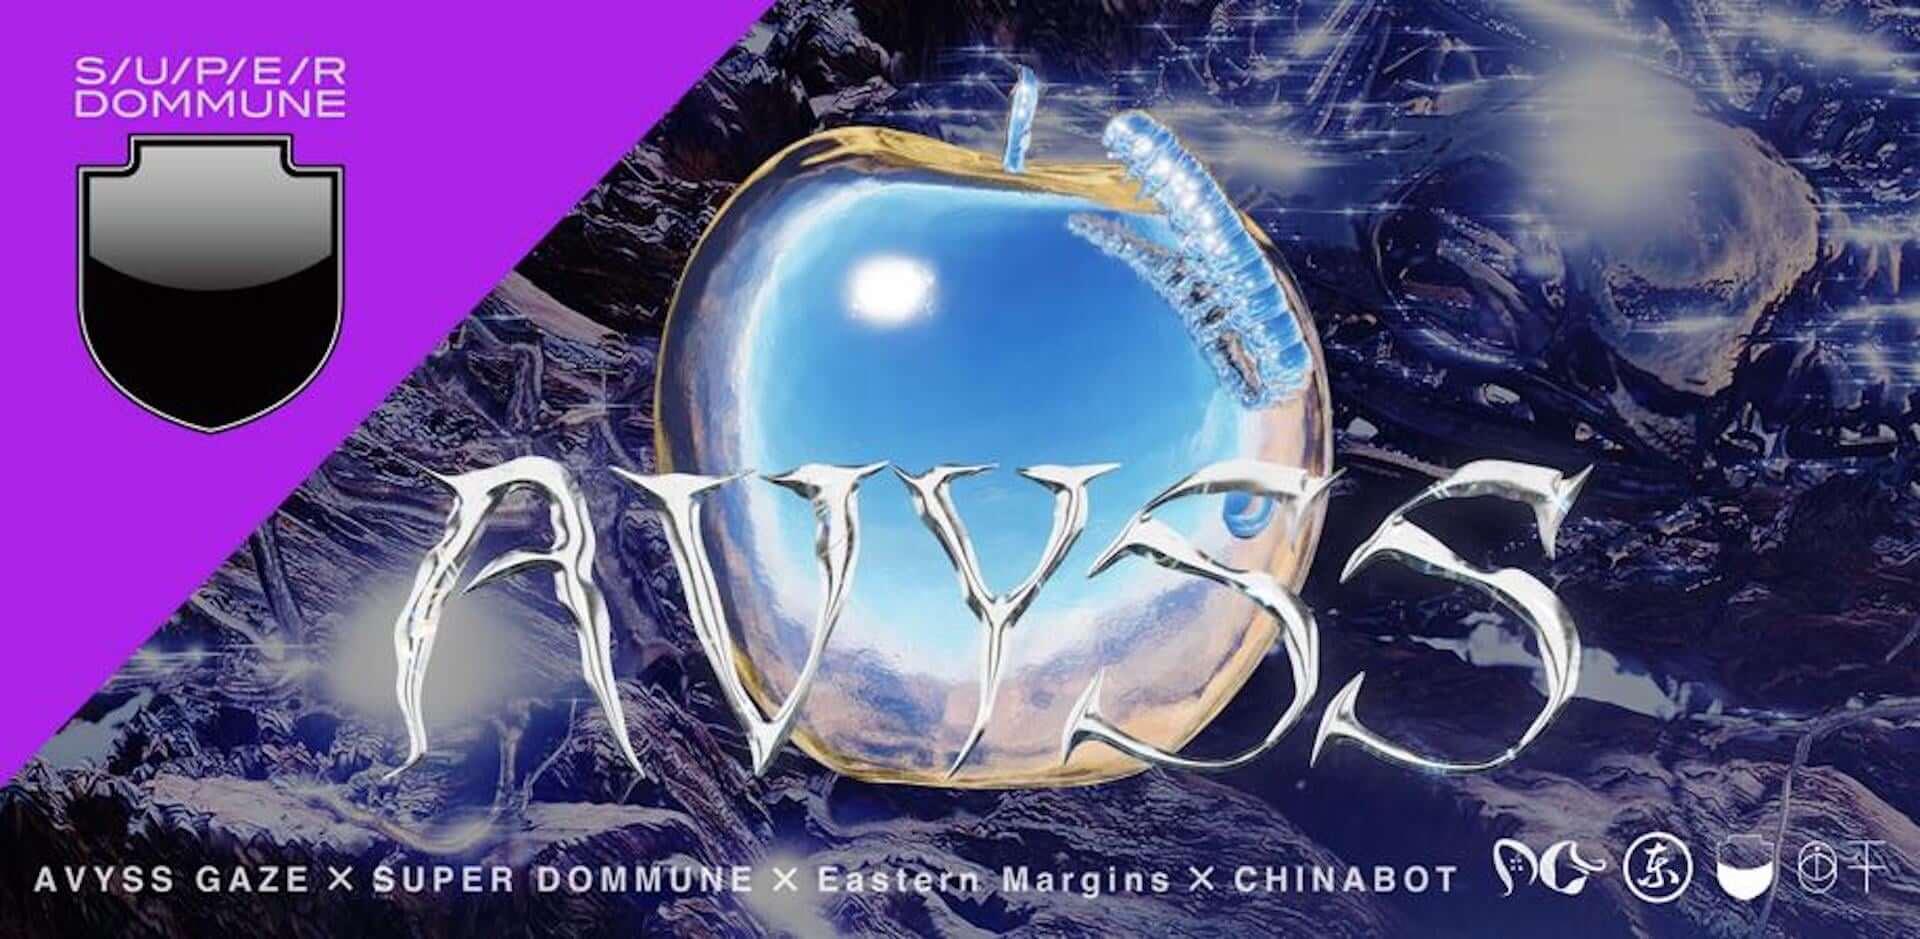 <AVYSS GAZE>がJUN INAGAWA、BBBBBBB、Masatoo Hiranoとのコラボアイテムを発表!バーチャルワールドも公開 music200918_avyssgaze_10-1920x939